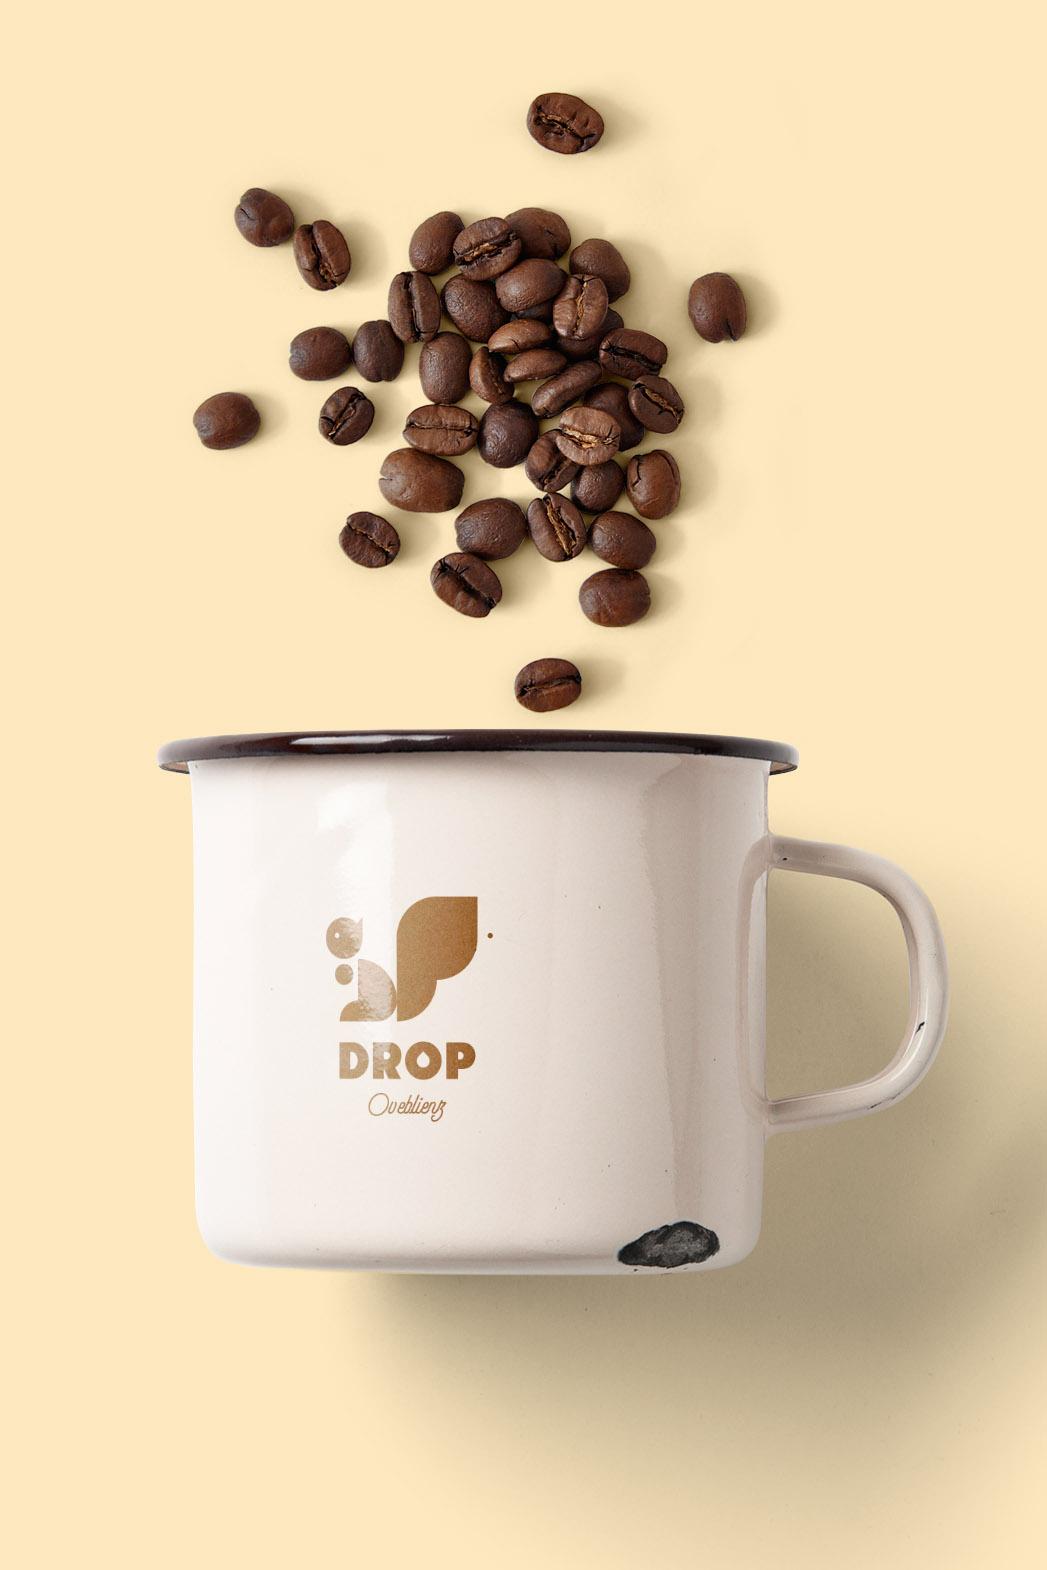 enamel cup design for coffee shop